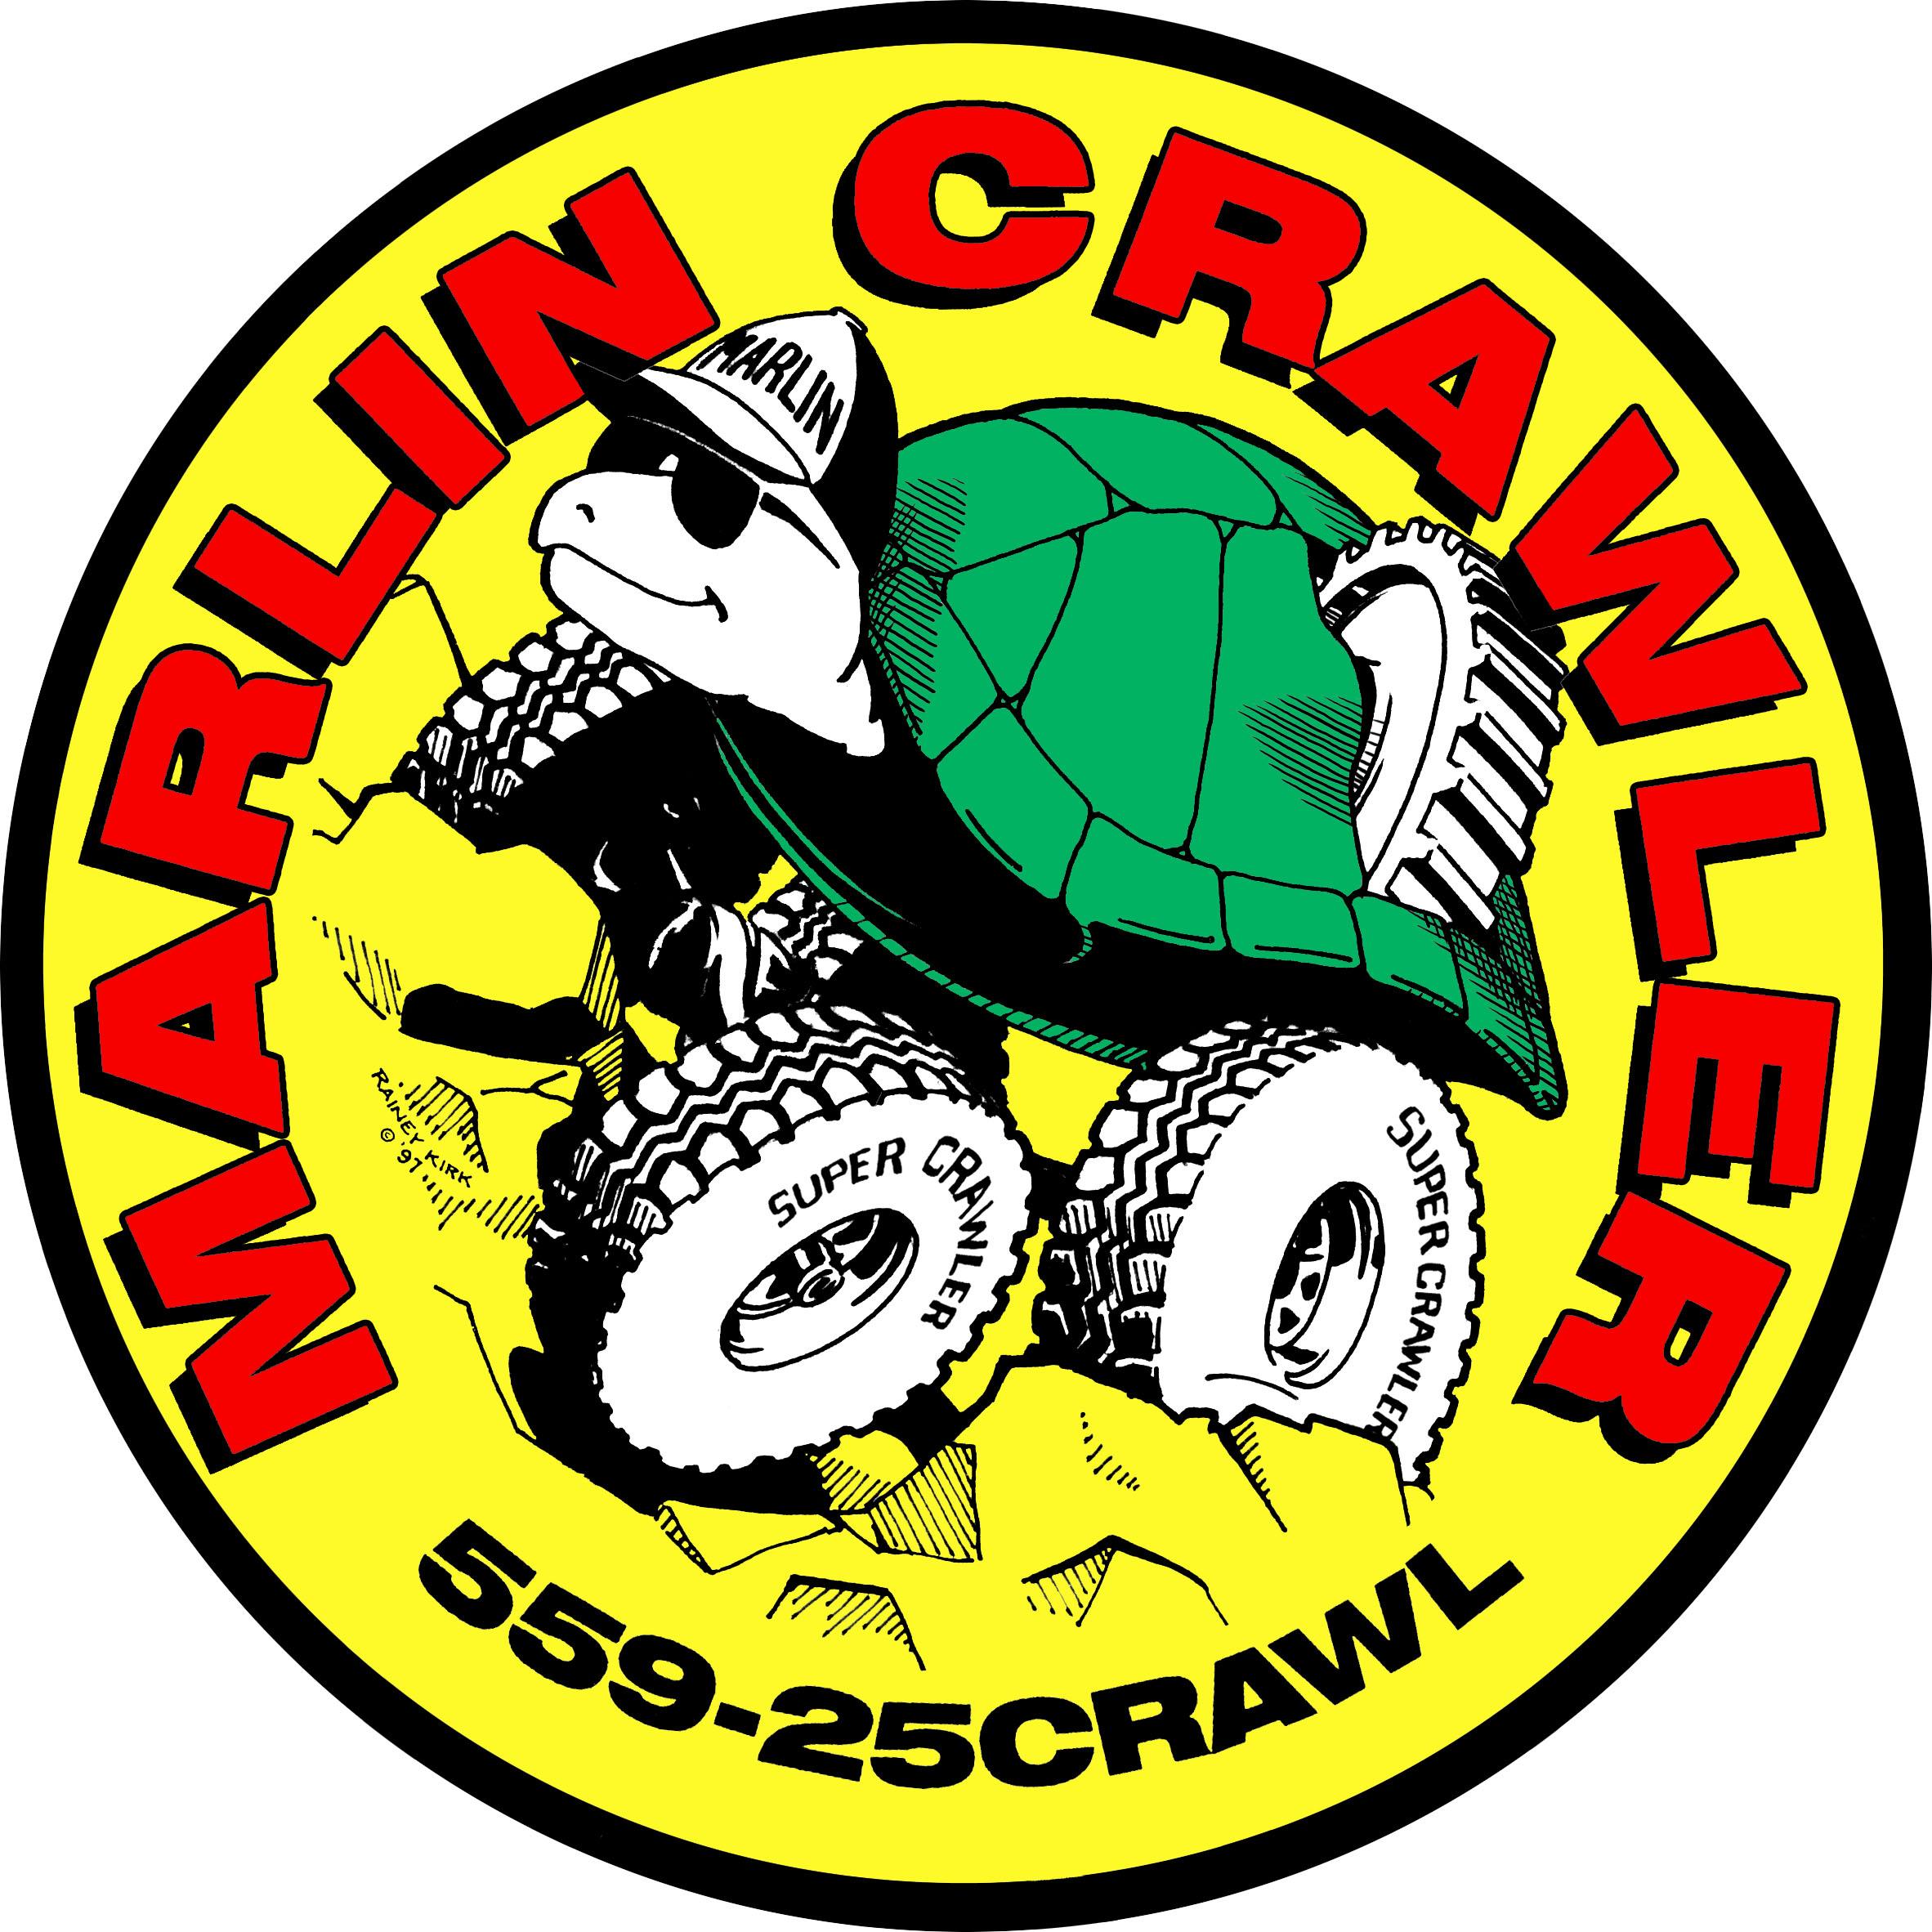 http://www.beadlok.com/Logo/Marlin%20Crawler%20-%20Turtle%20Logo.jpg